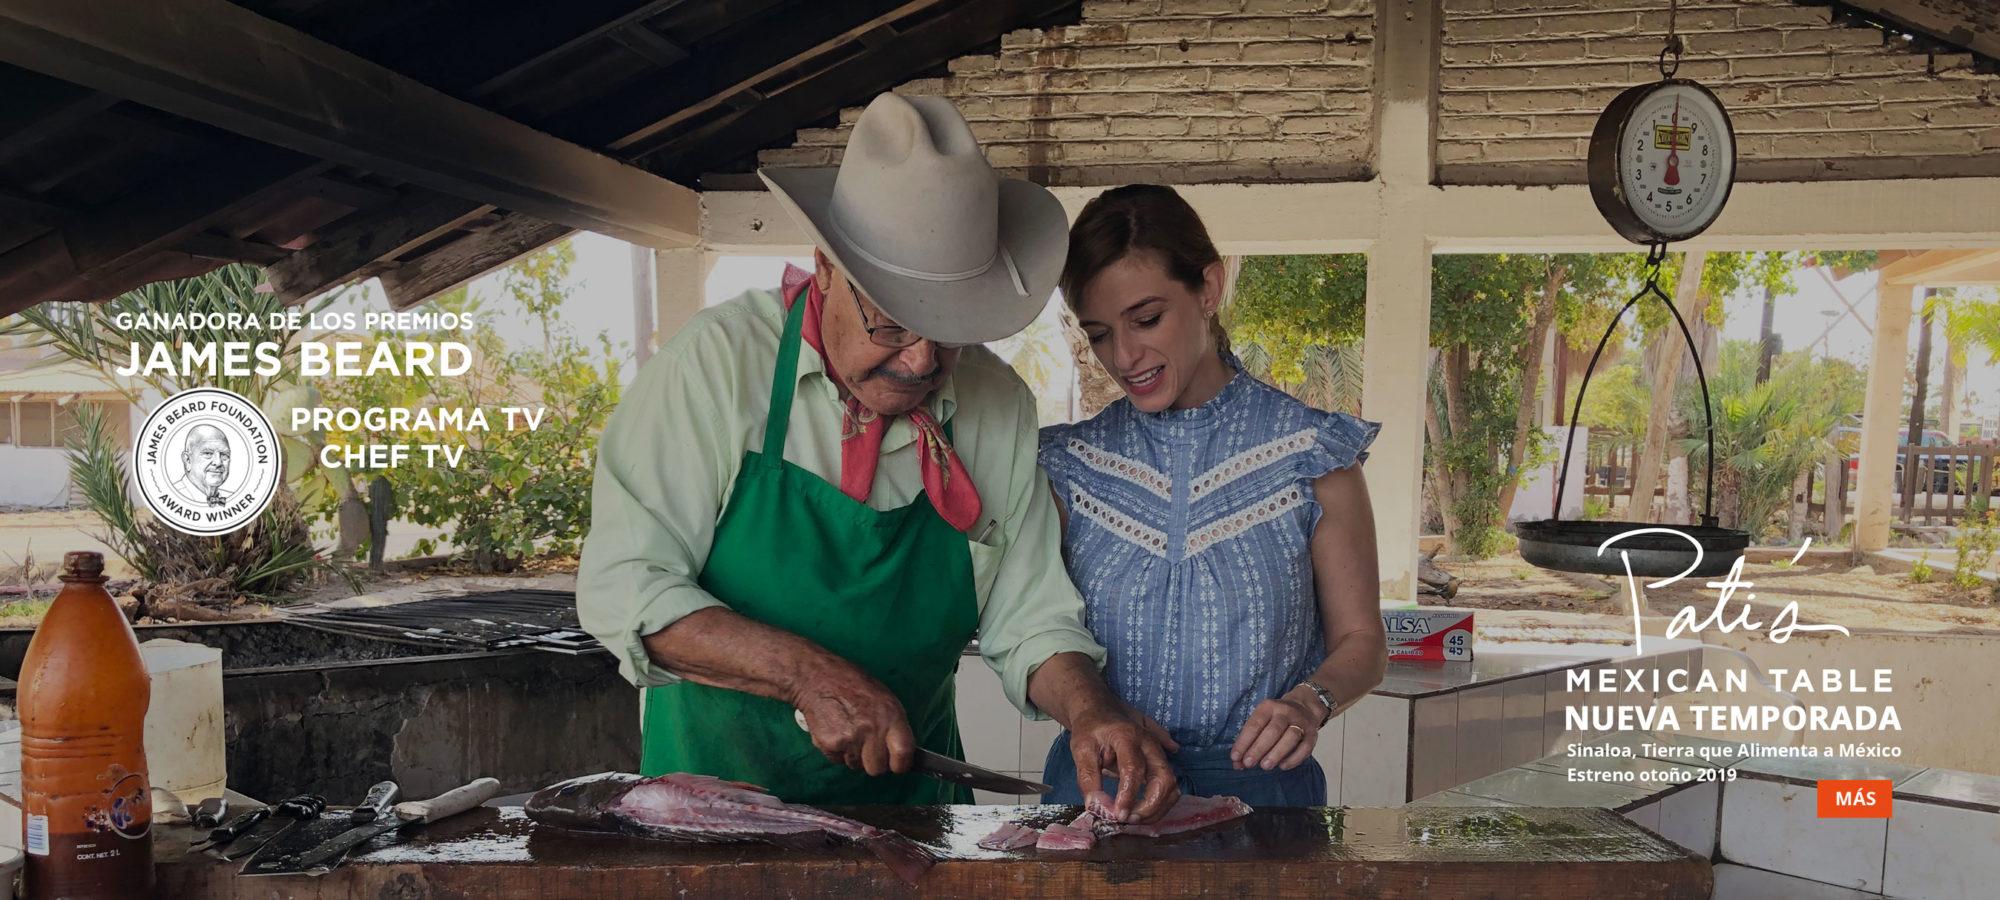 Pati's Mexican Table Programa de TV